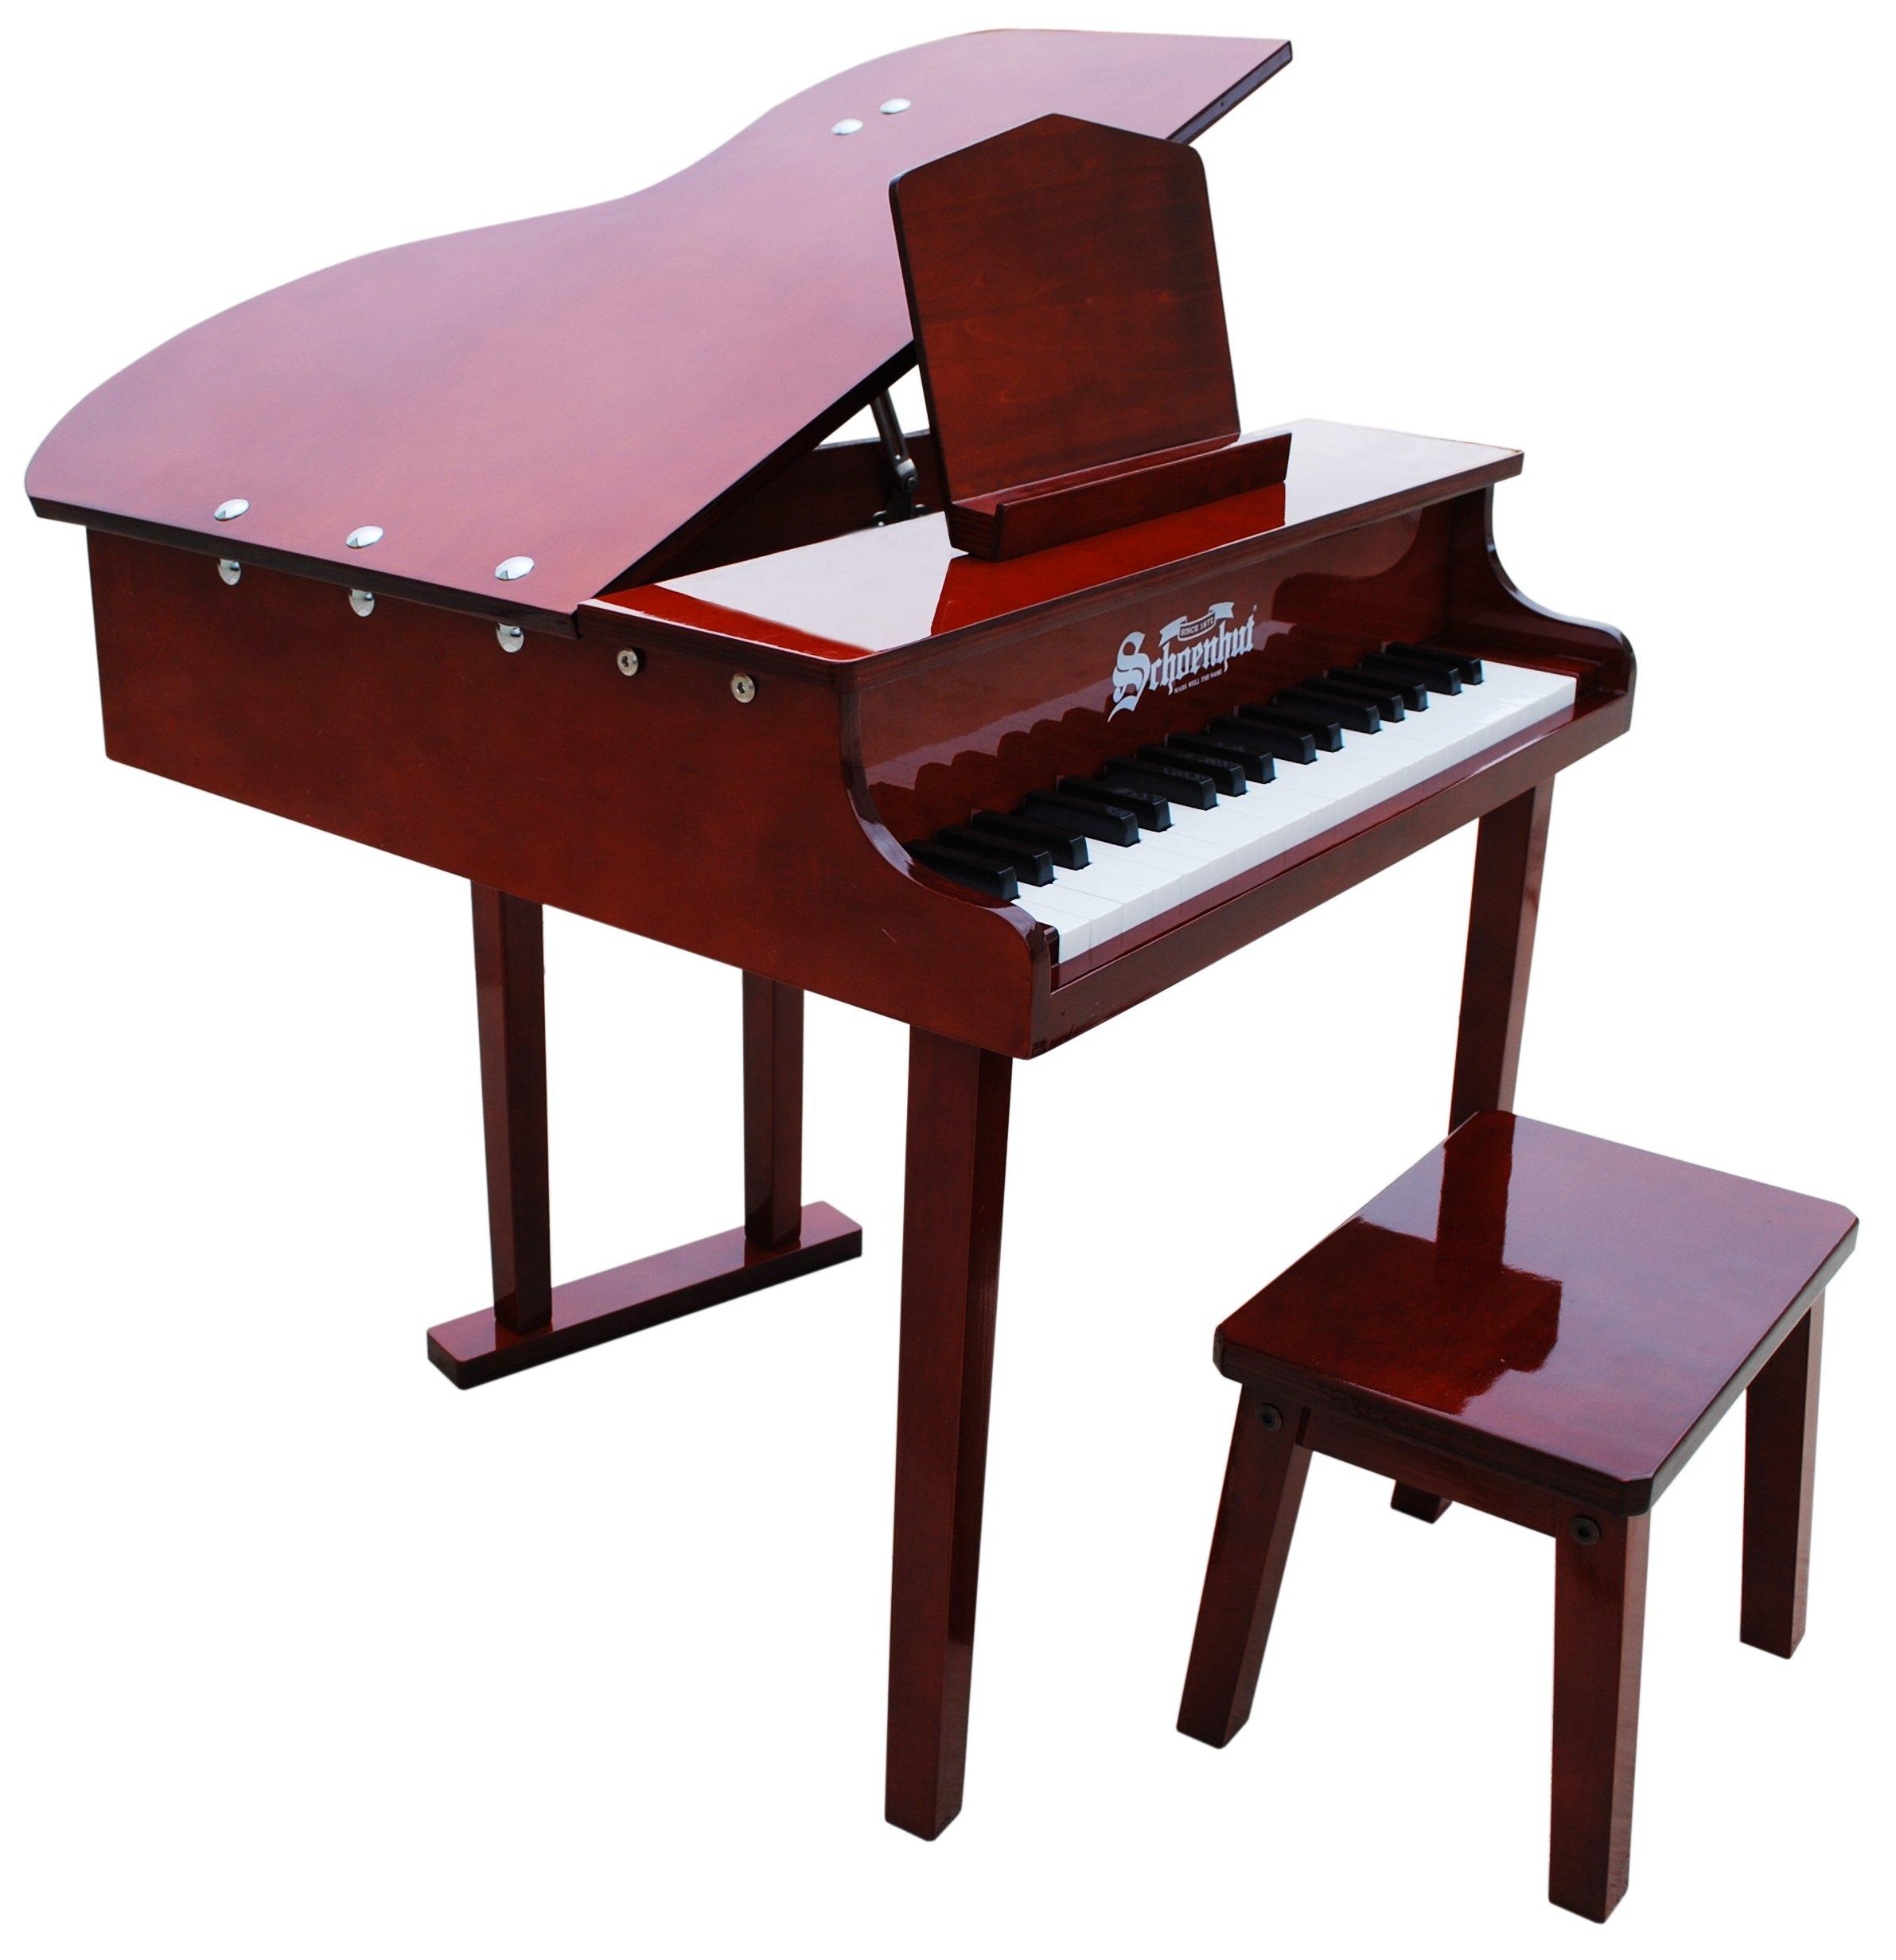 Schoenhut 37 Key Concert Baby Grand with Bench by Schoenhut (Image #1)